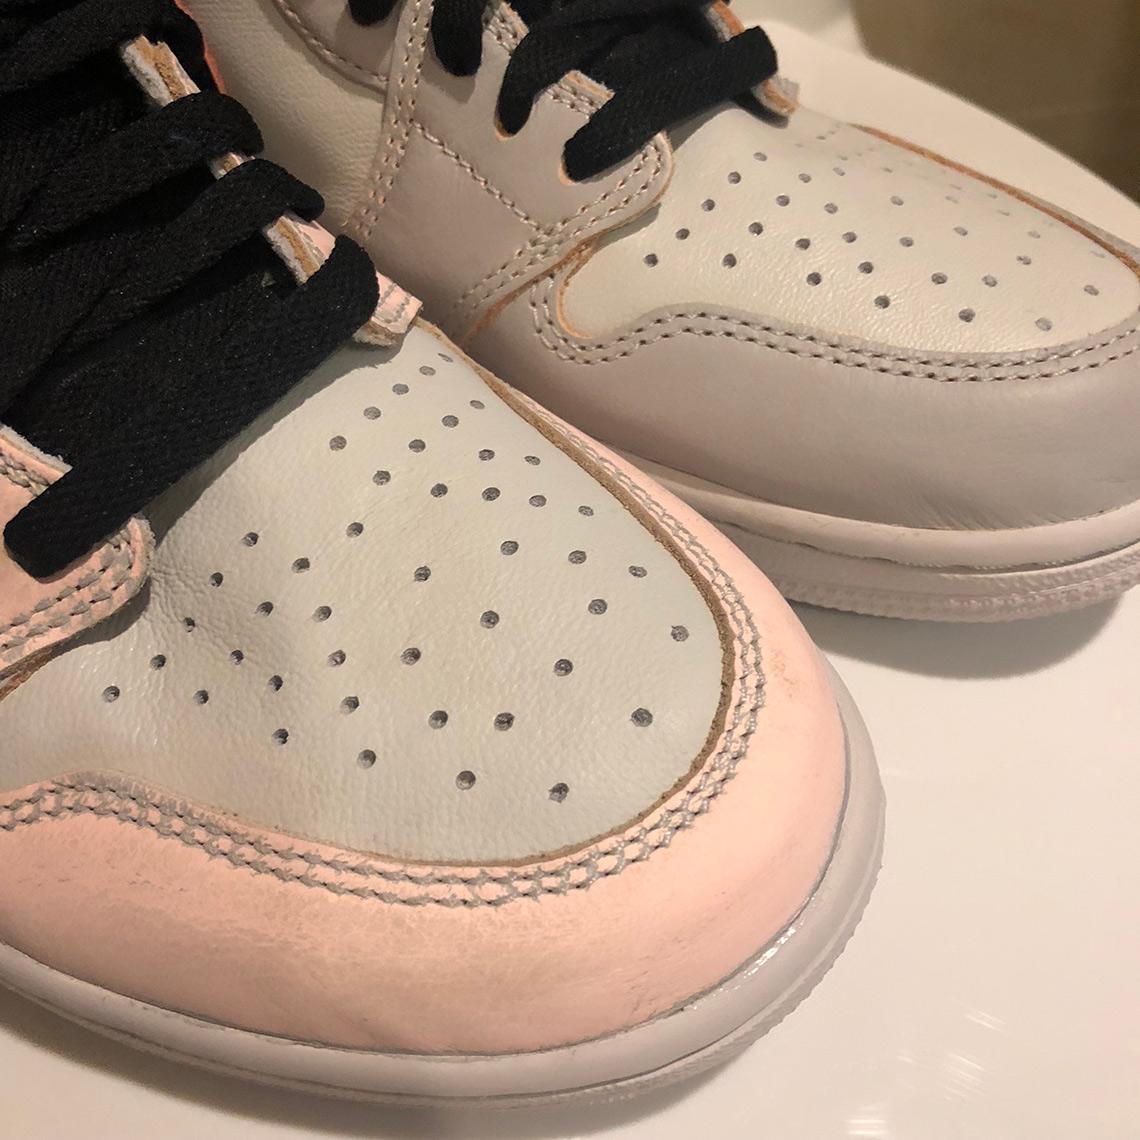 newest dc02d 6b216 Nike SB Air Jordan 1 Light Bone Under Layer   SneakerNews.com